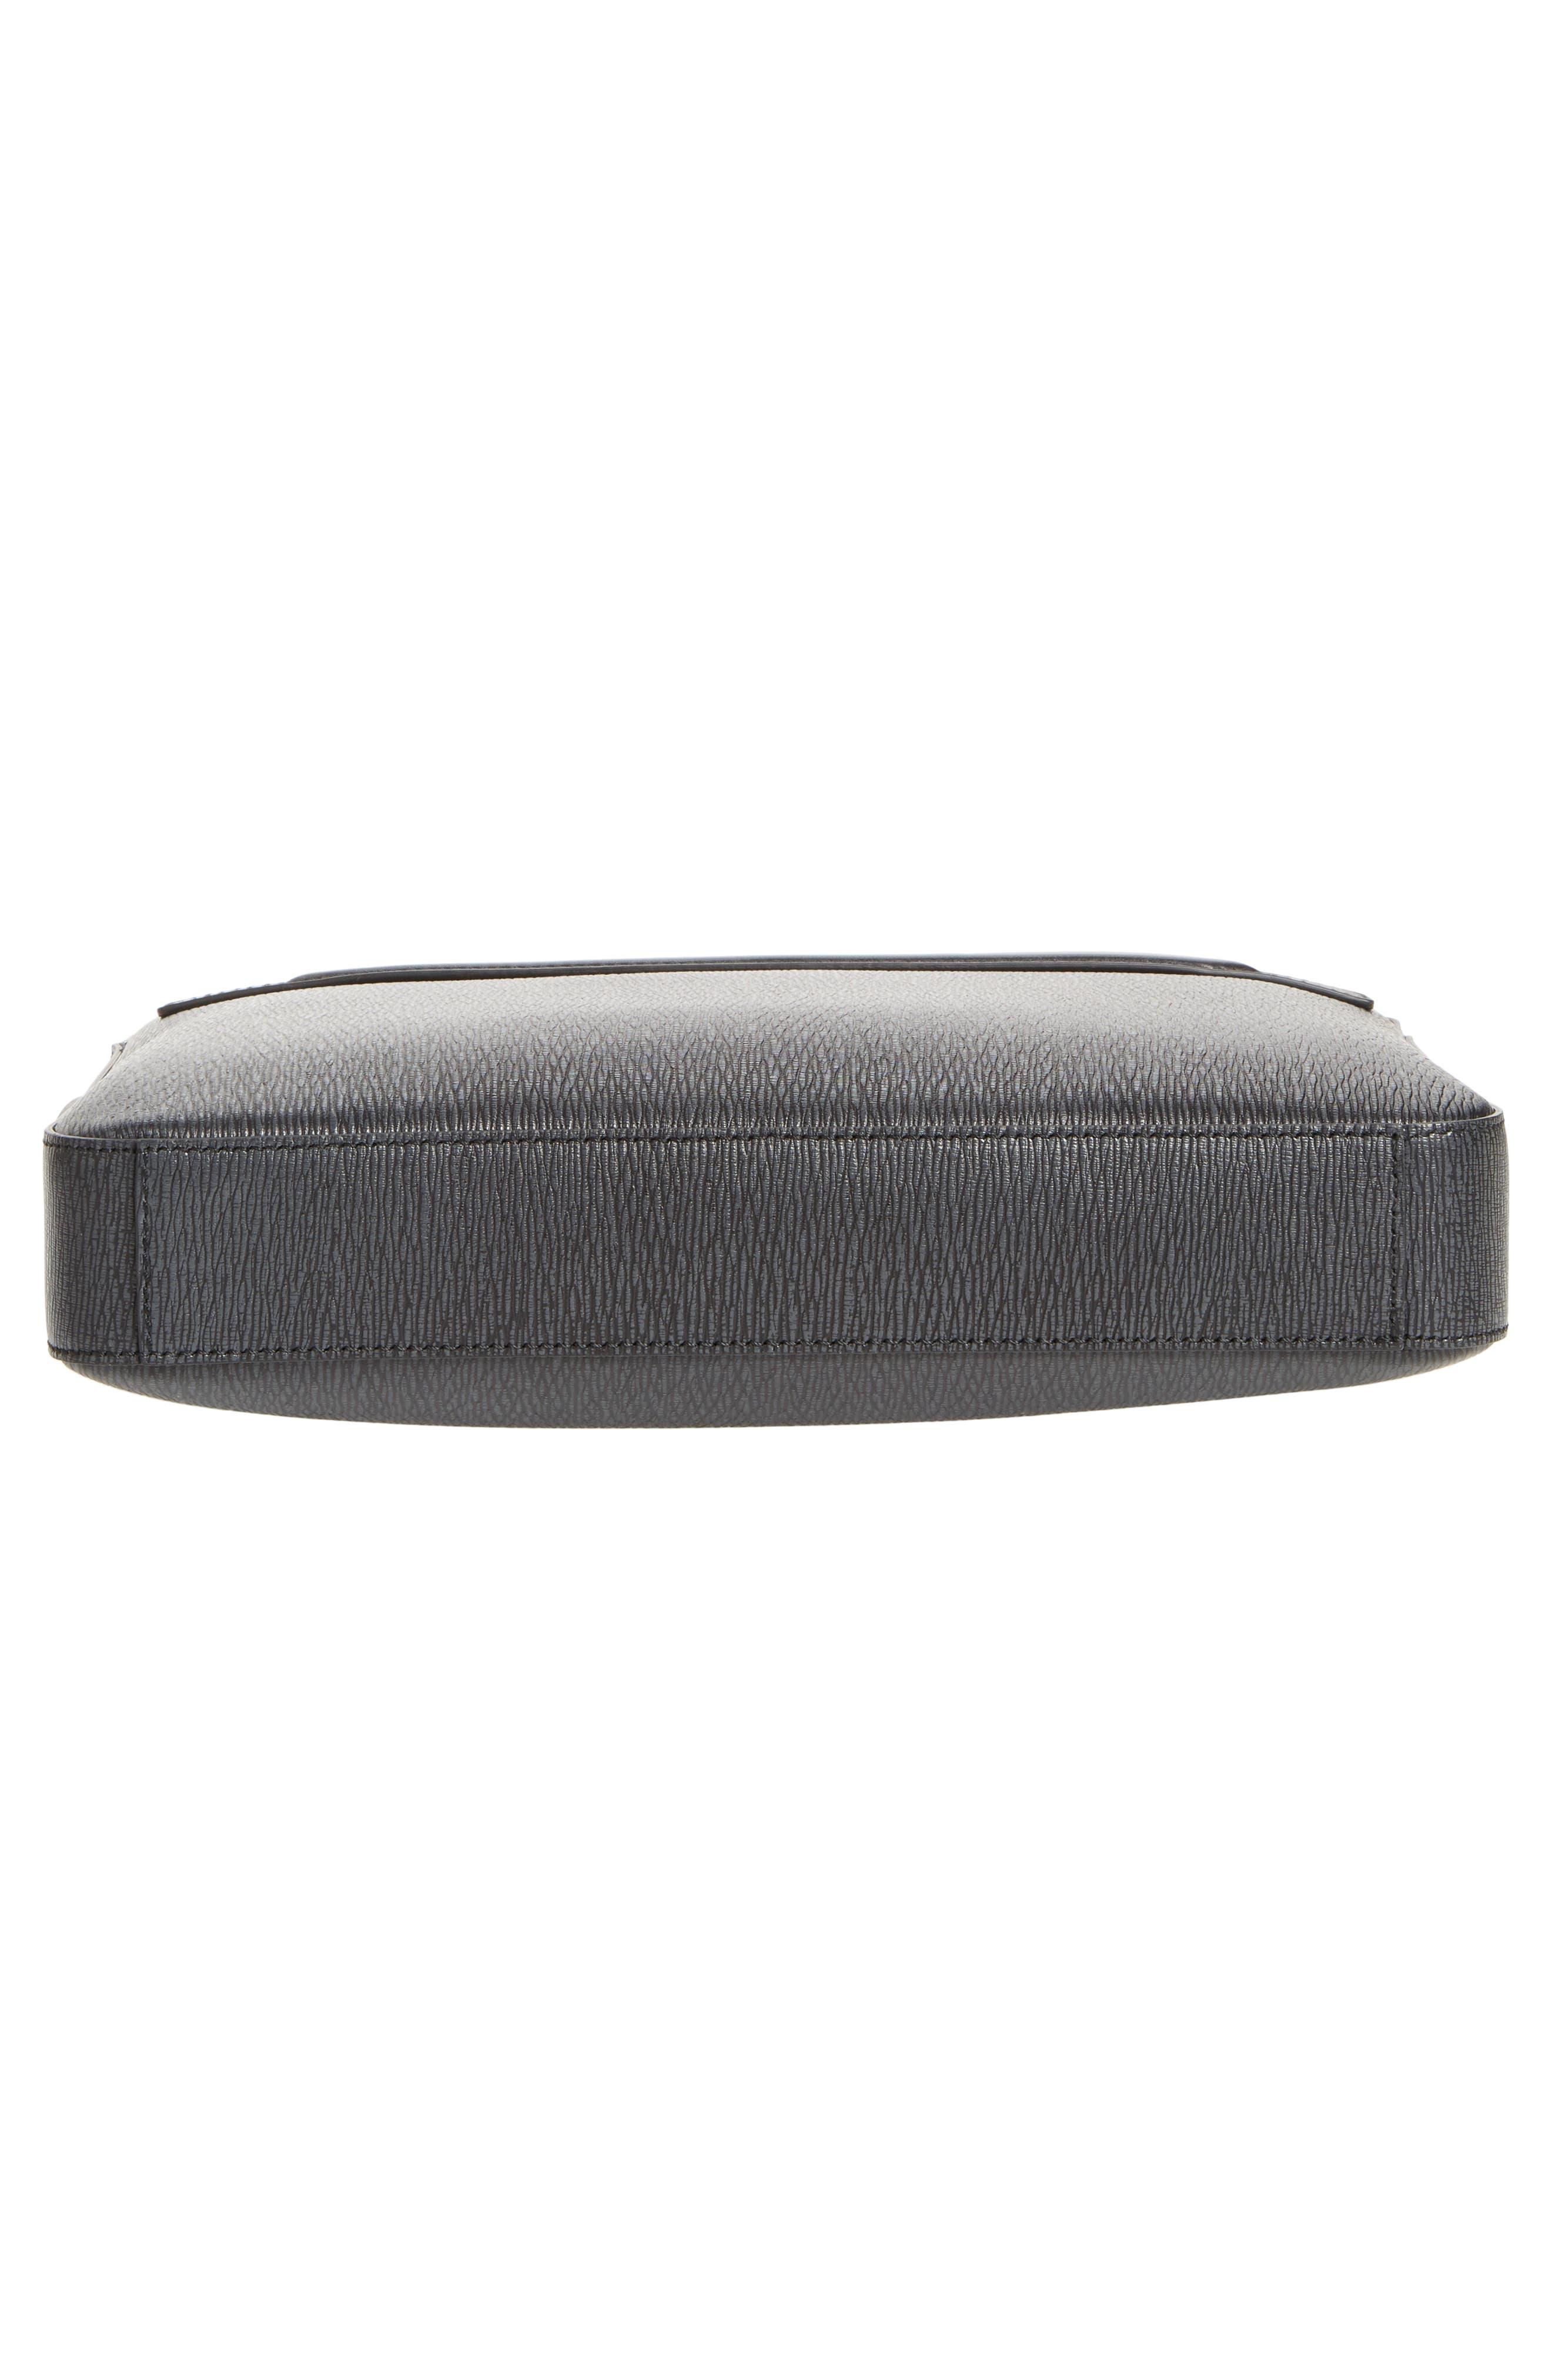 SALVATORE FERRAGAMO, Textured Leather Briefcase, Alternate thumbnail 6, color, GRIGIO/ NERO